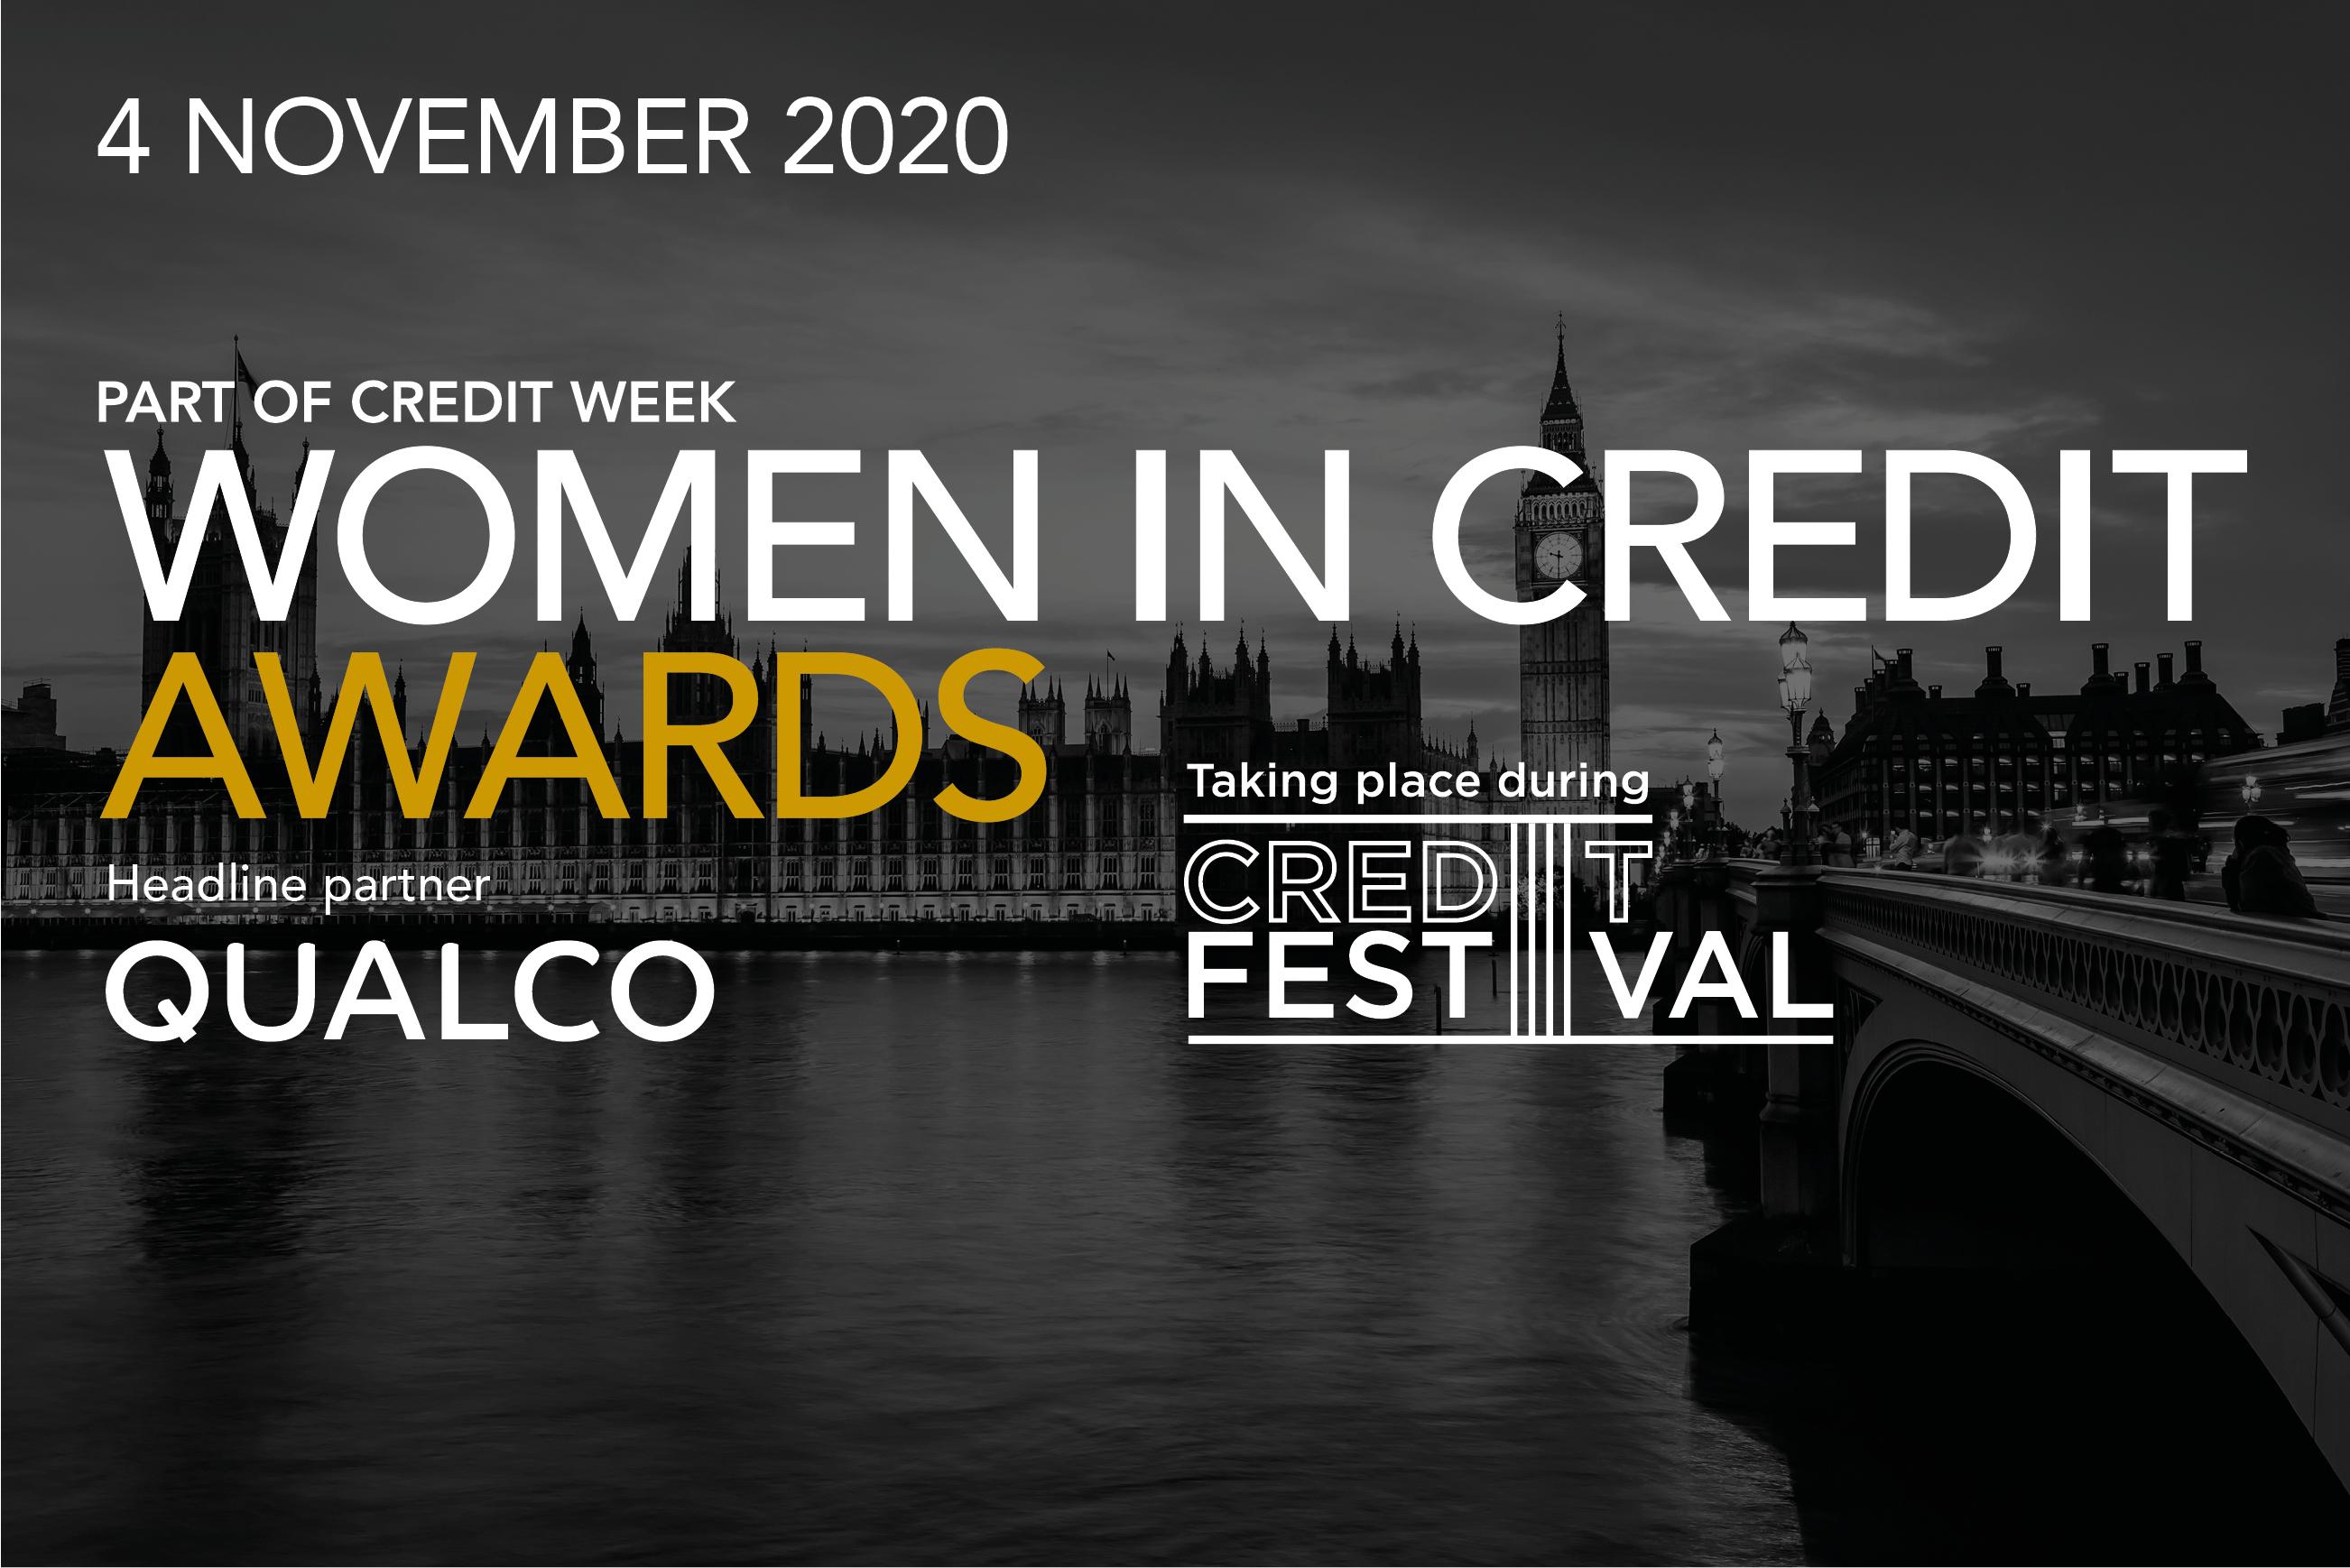 Women in Credit Awards